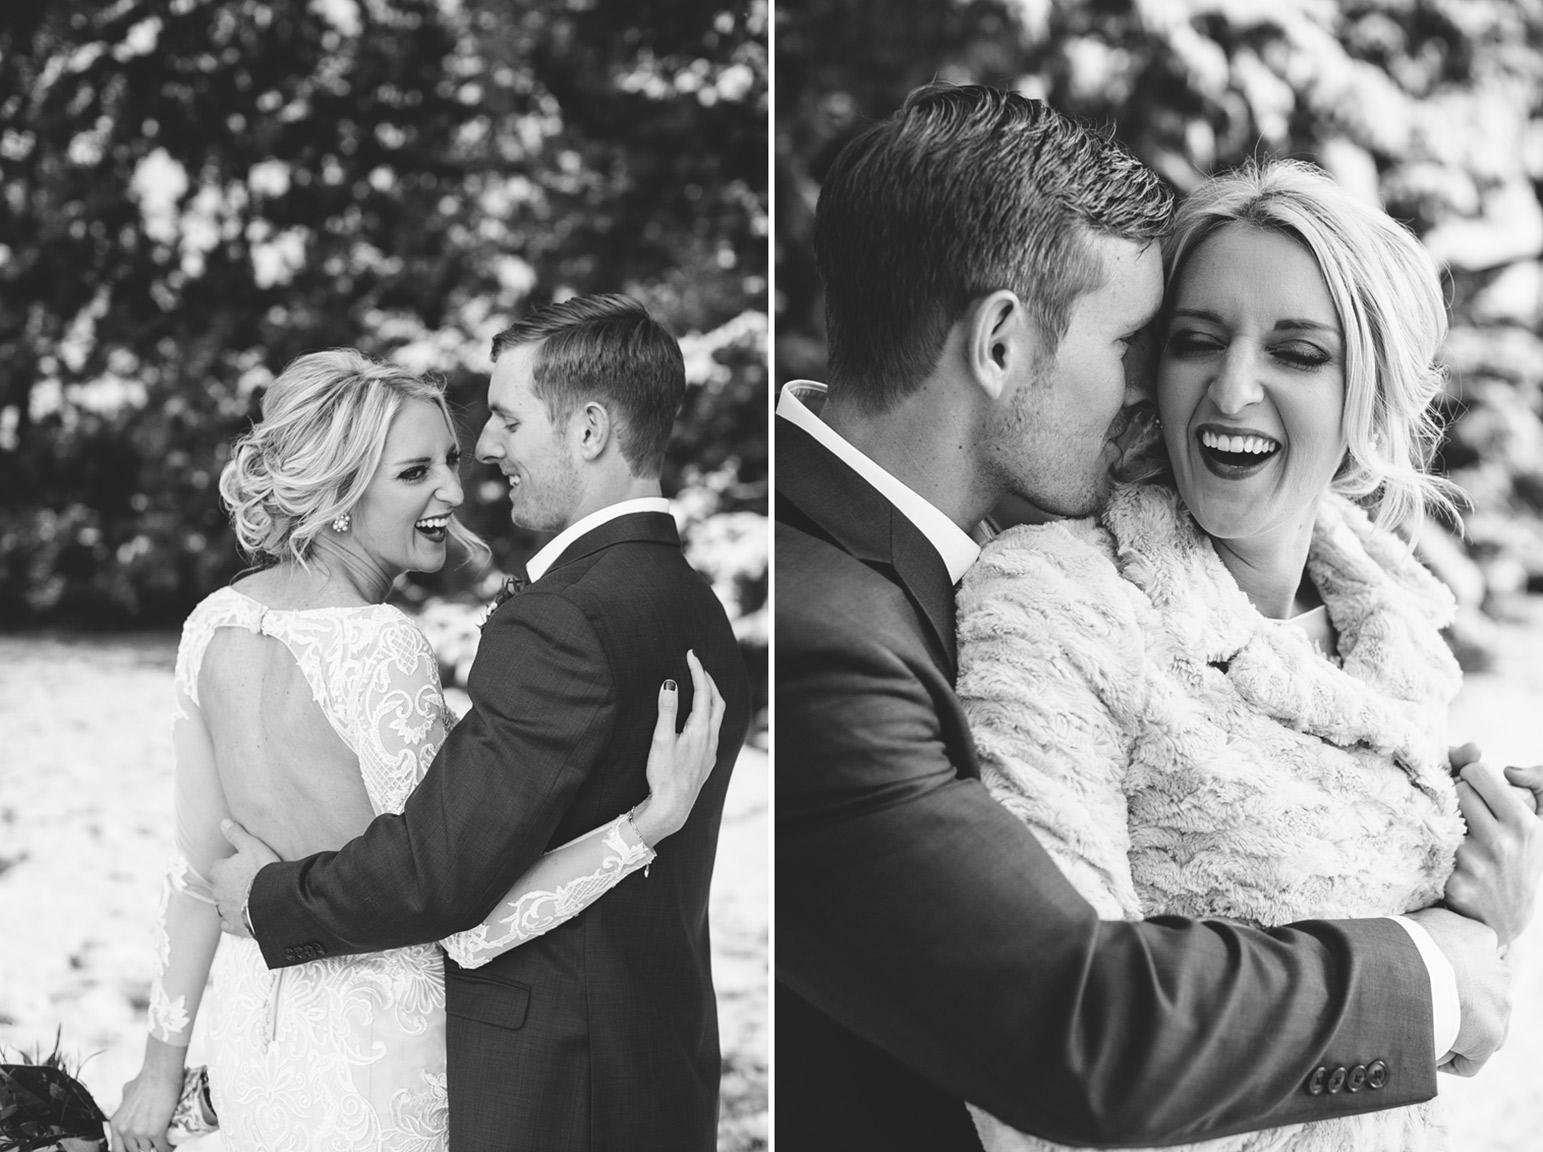 Cotton_Creek_Barn_Winter_Wedding_WeddingPhotographer022.jpg